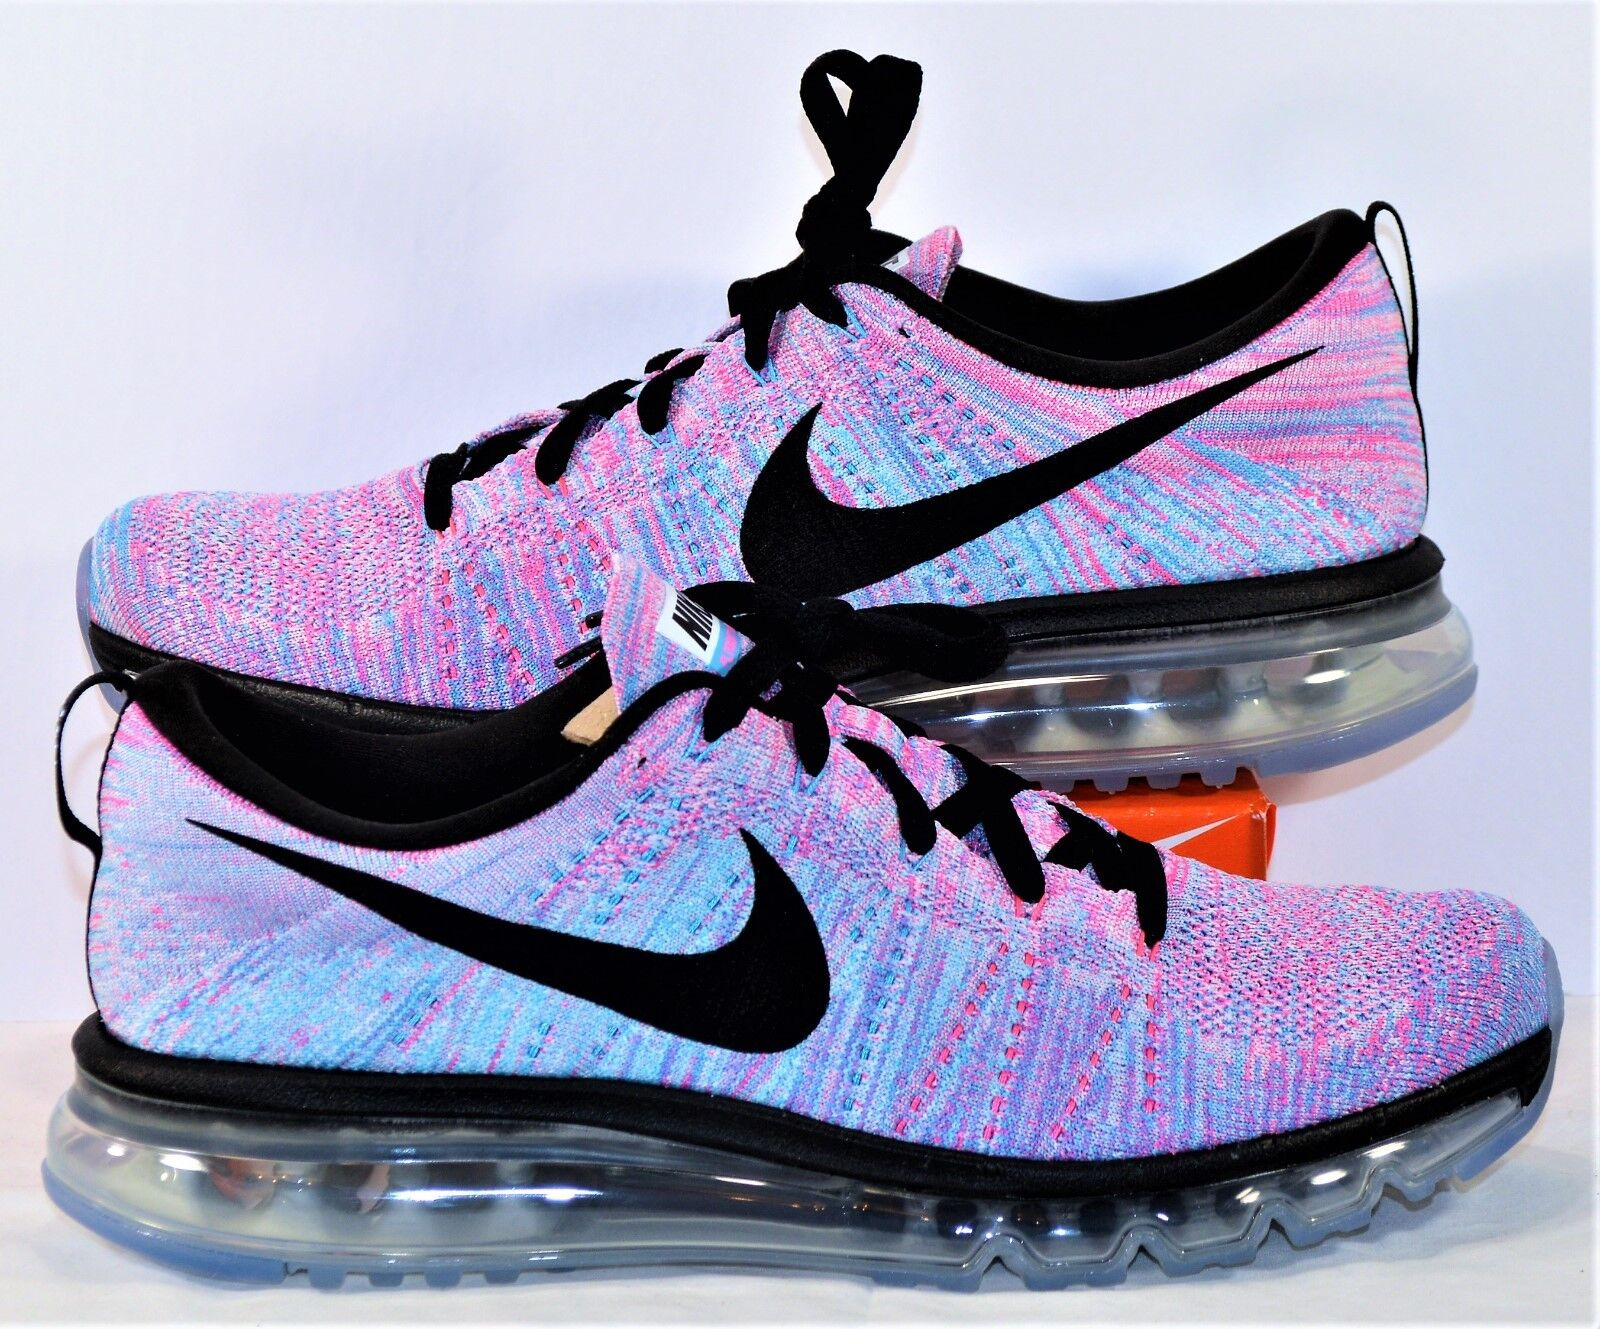 Nike Flyknit Air Max Blue & Pink Black Women Running Shoes Sz 12 NEW 620659 104 Cheap and beautiful fashion